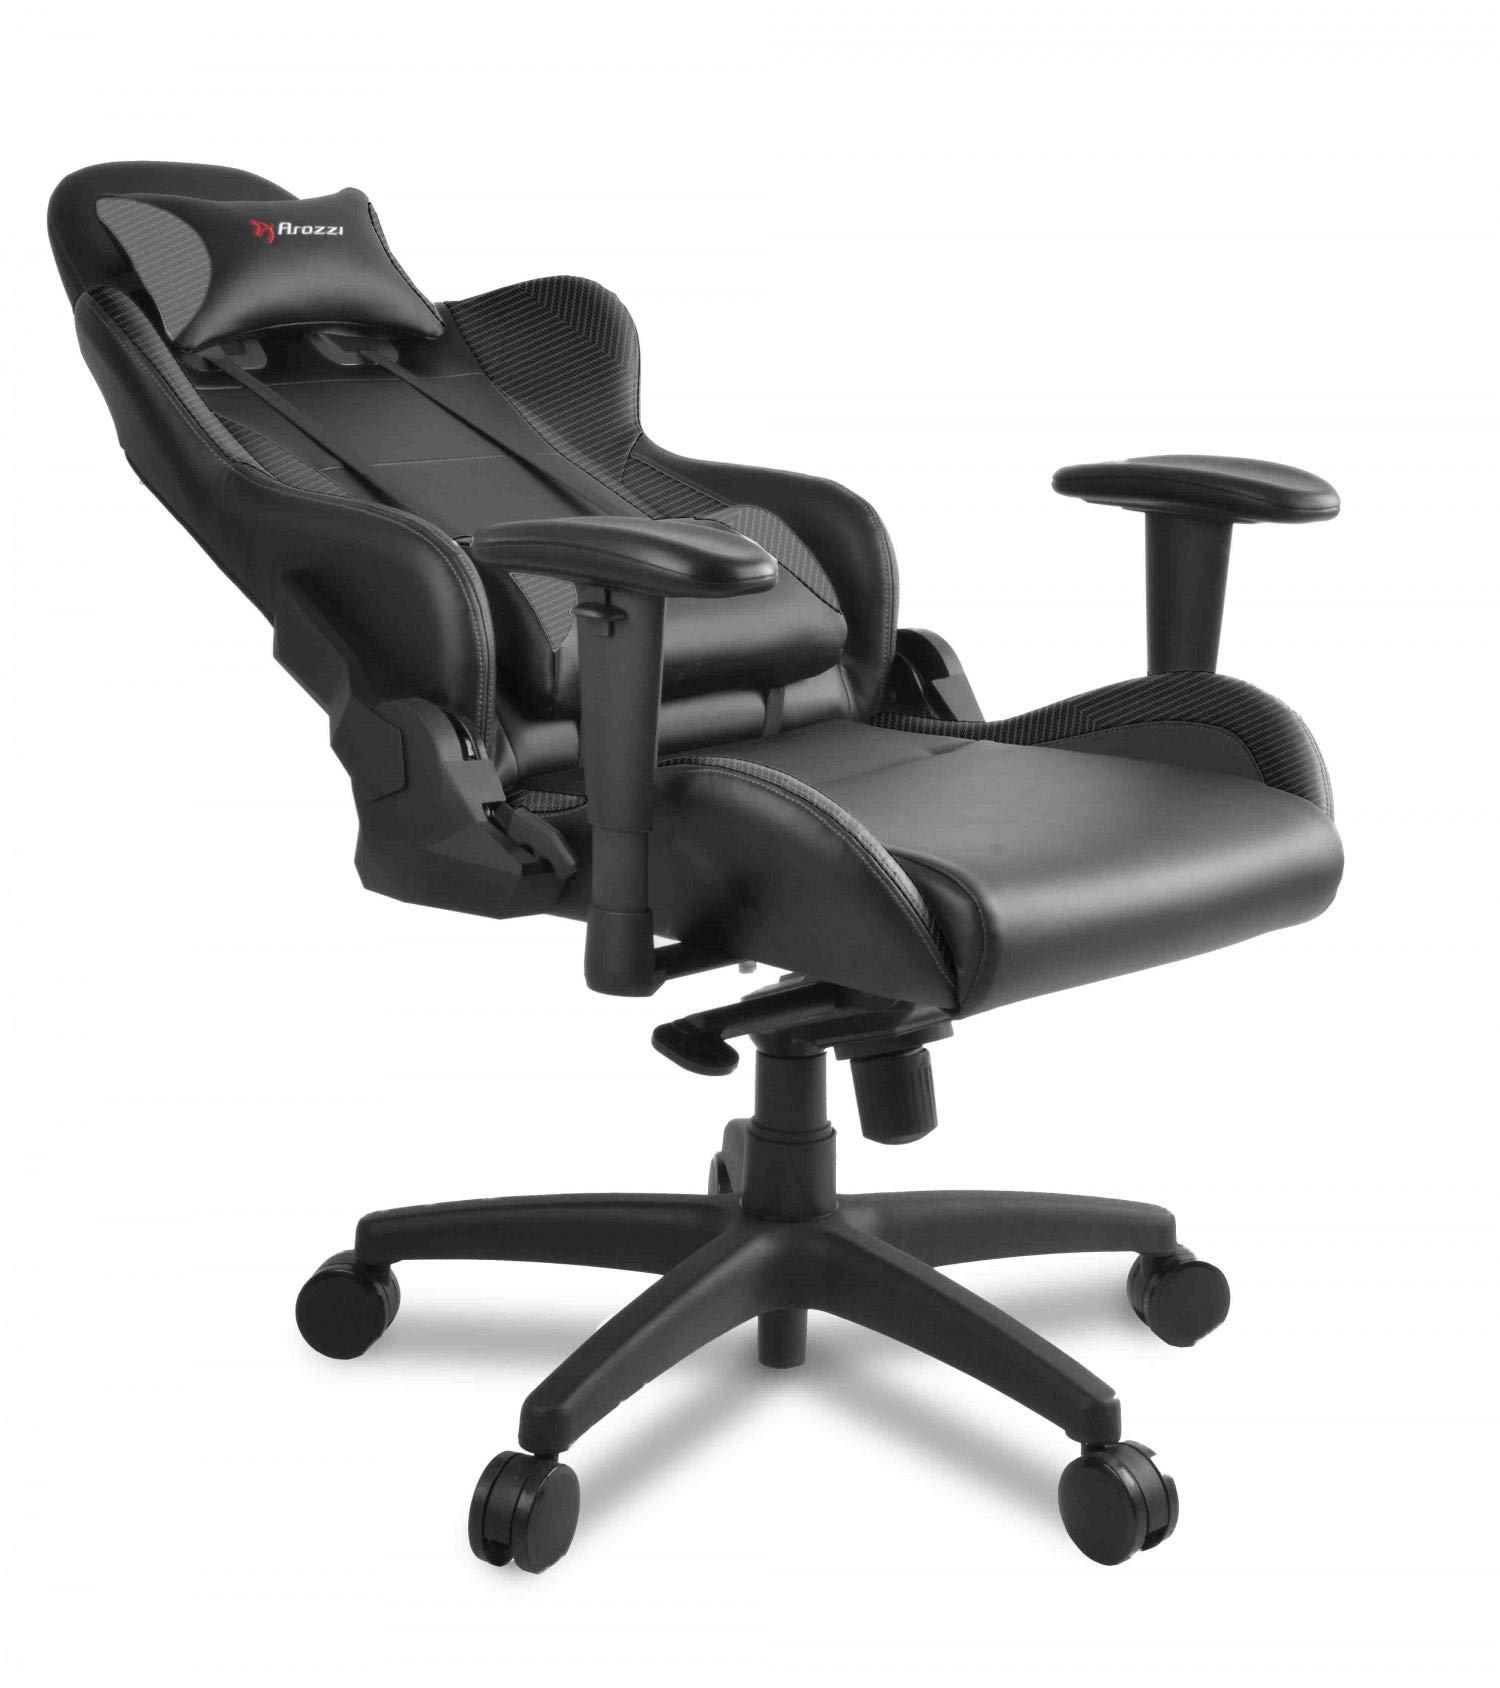 Superb Arozzi Verona Pro V2 Gaming Chair Carbon Black Edition Price Machost Co Dining Chair Design Ideas Machostcouk